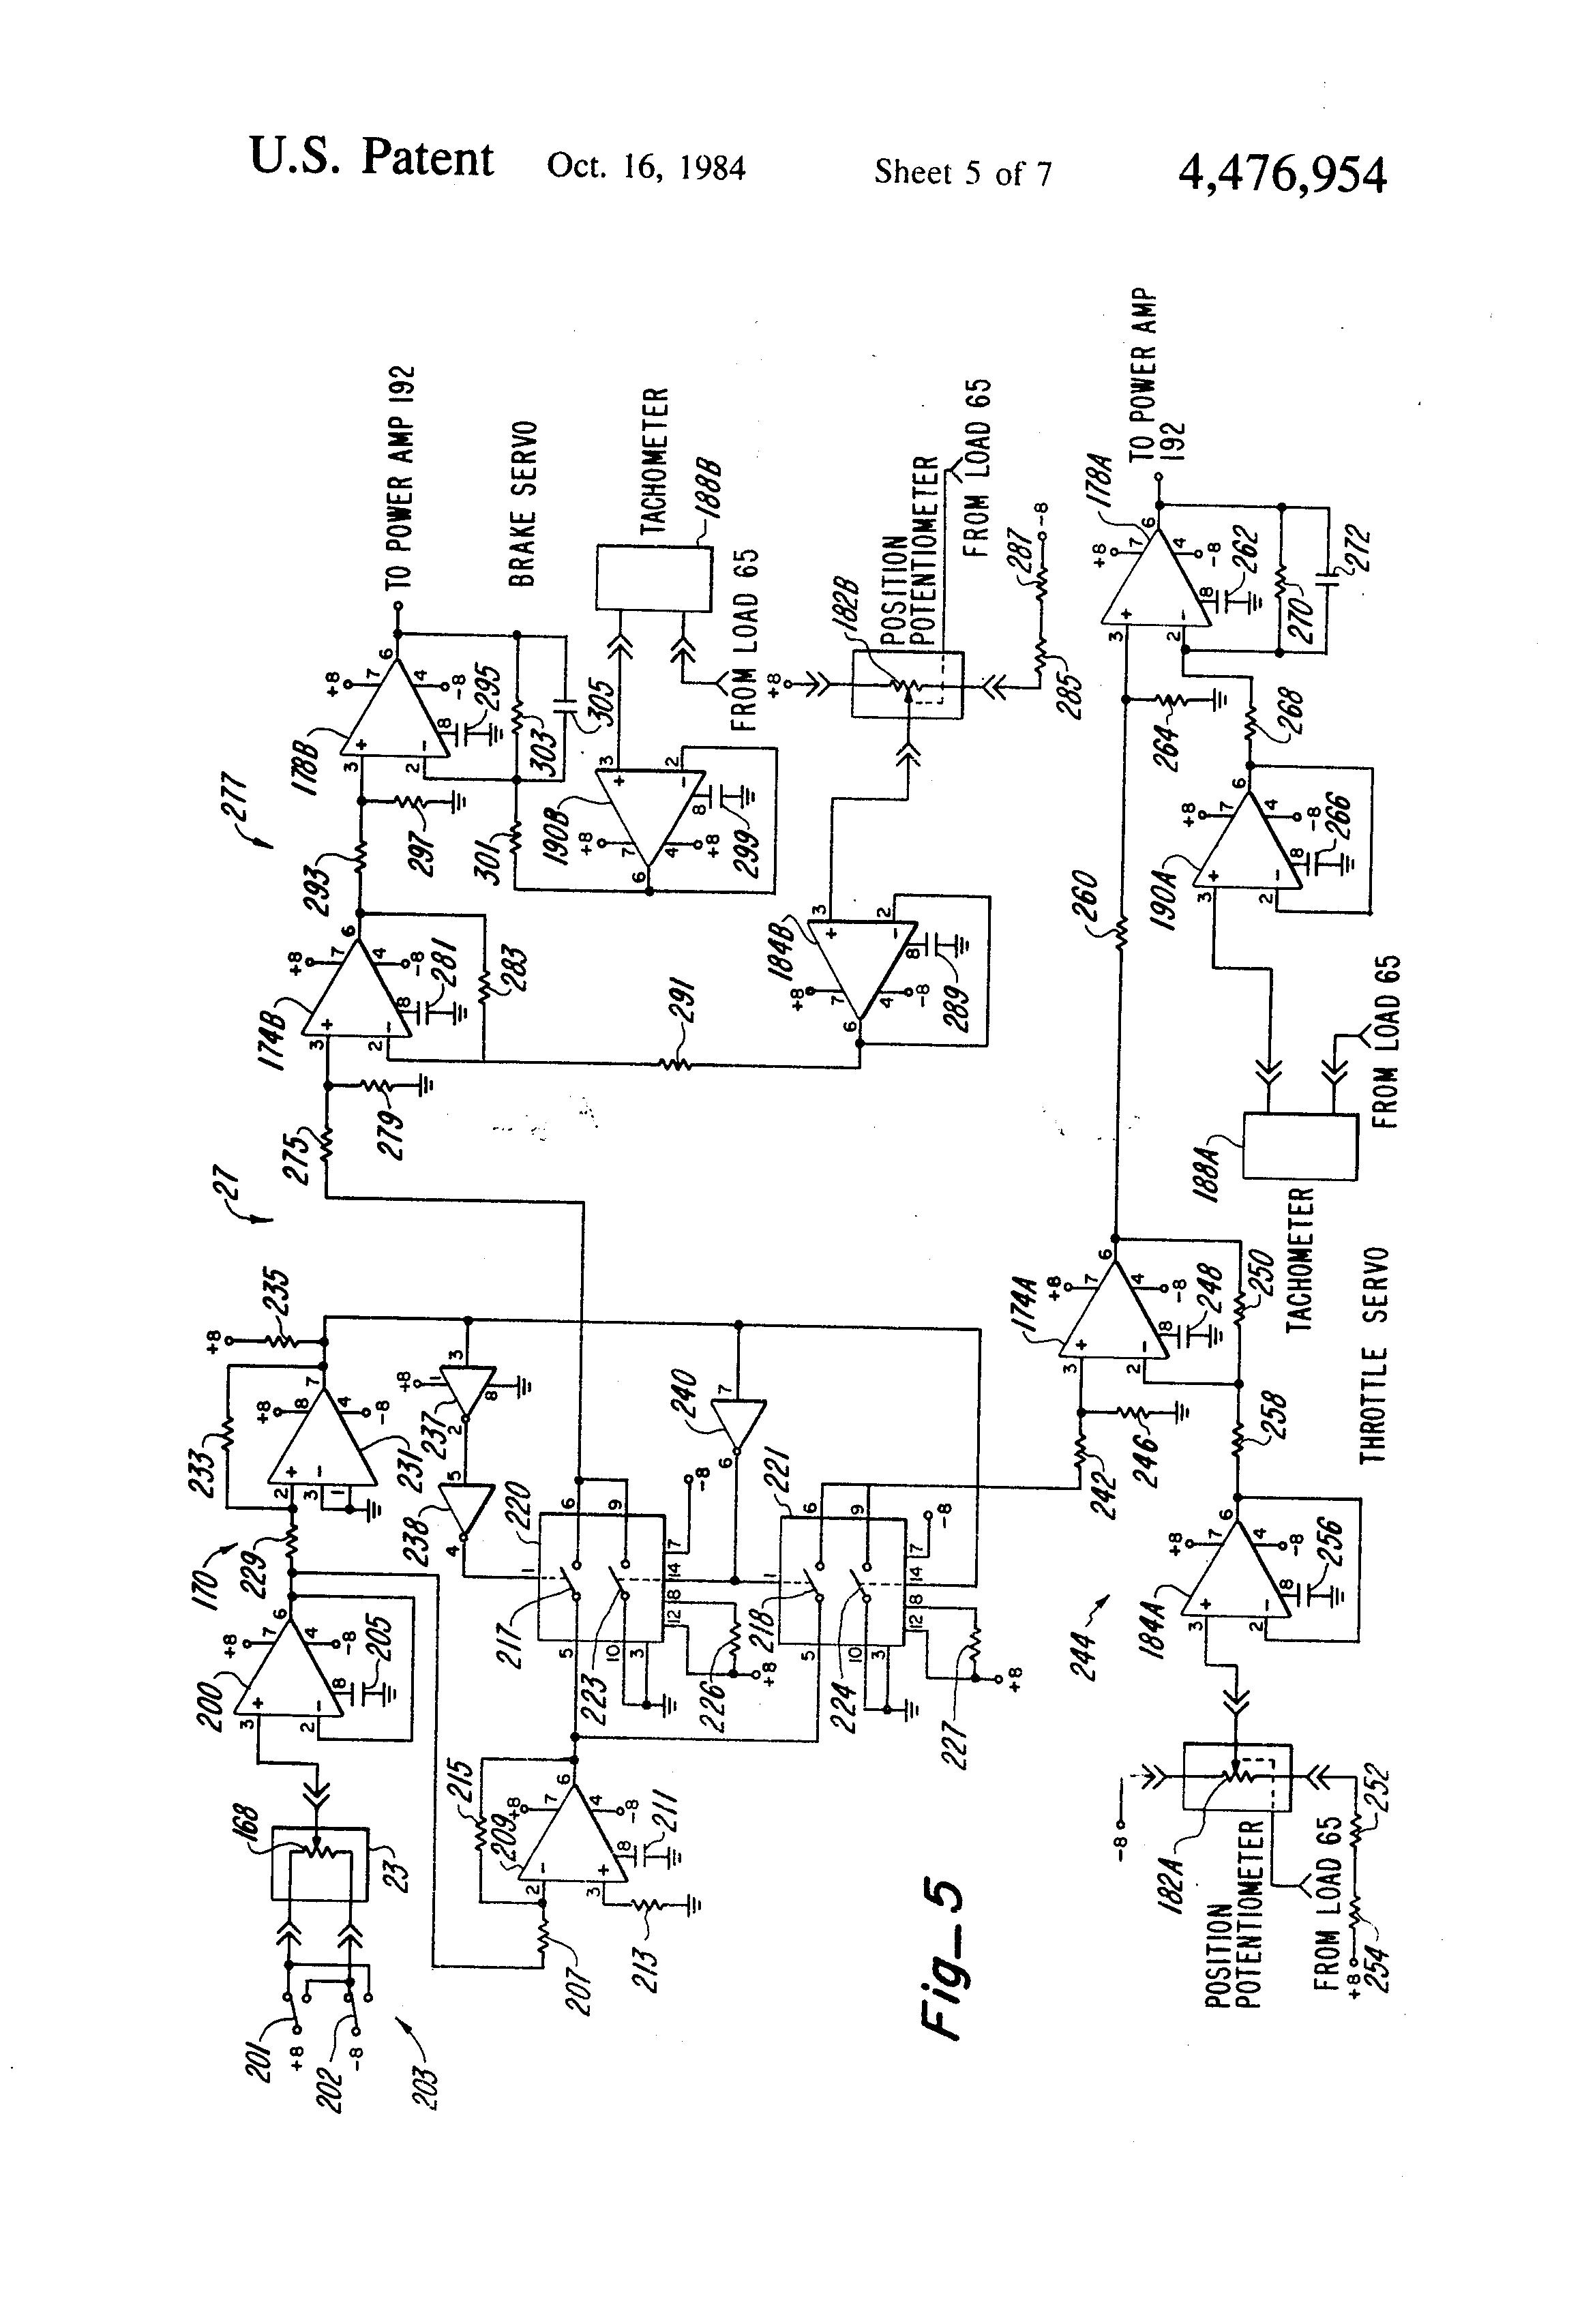 Wiring Diagram For John Deere 2510